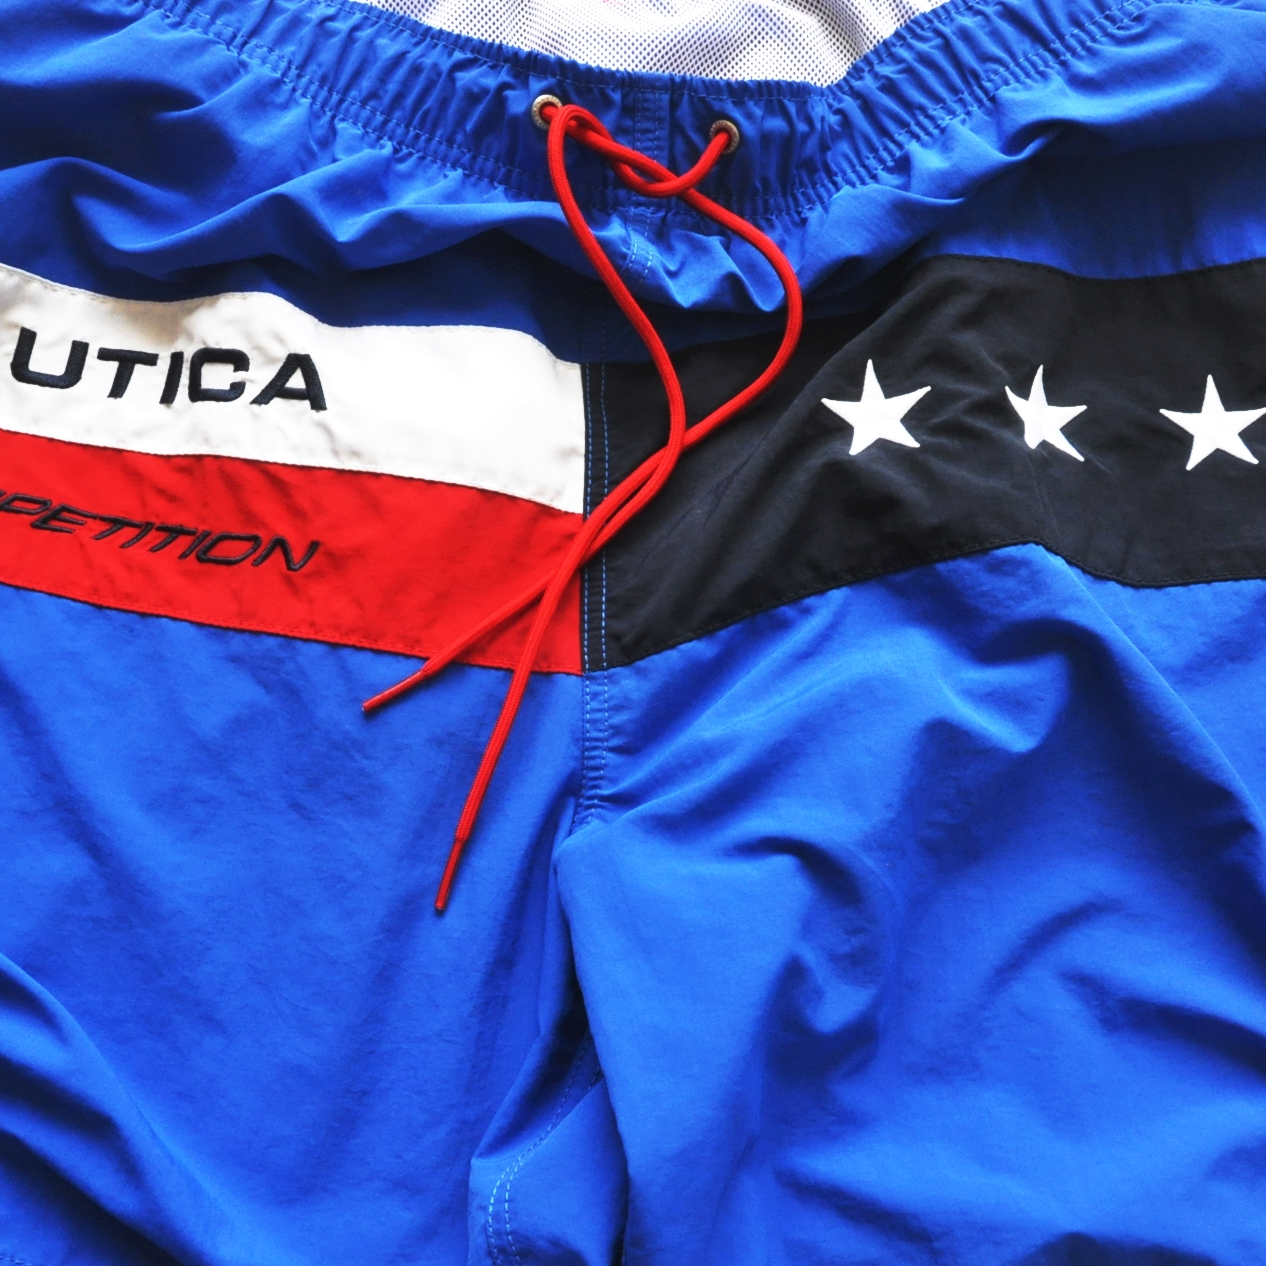 NAUTICA/ノーティカ NAUTICA COMPETITION SWIM PANTS BIG SIZE-3